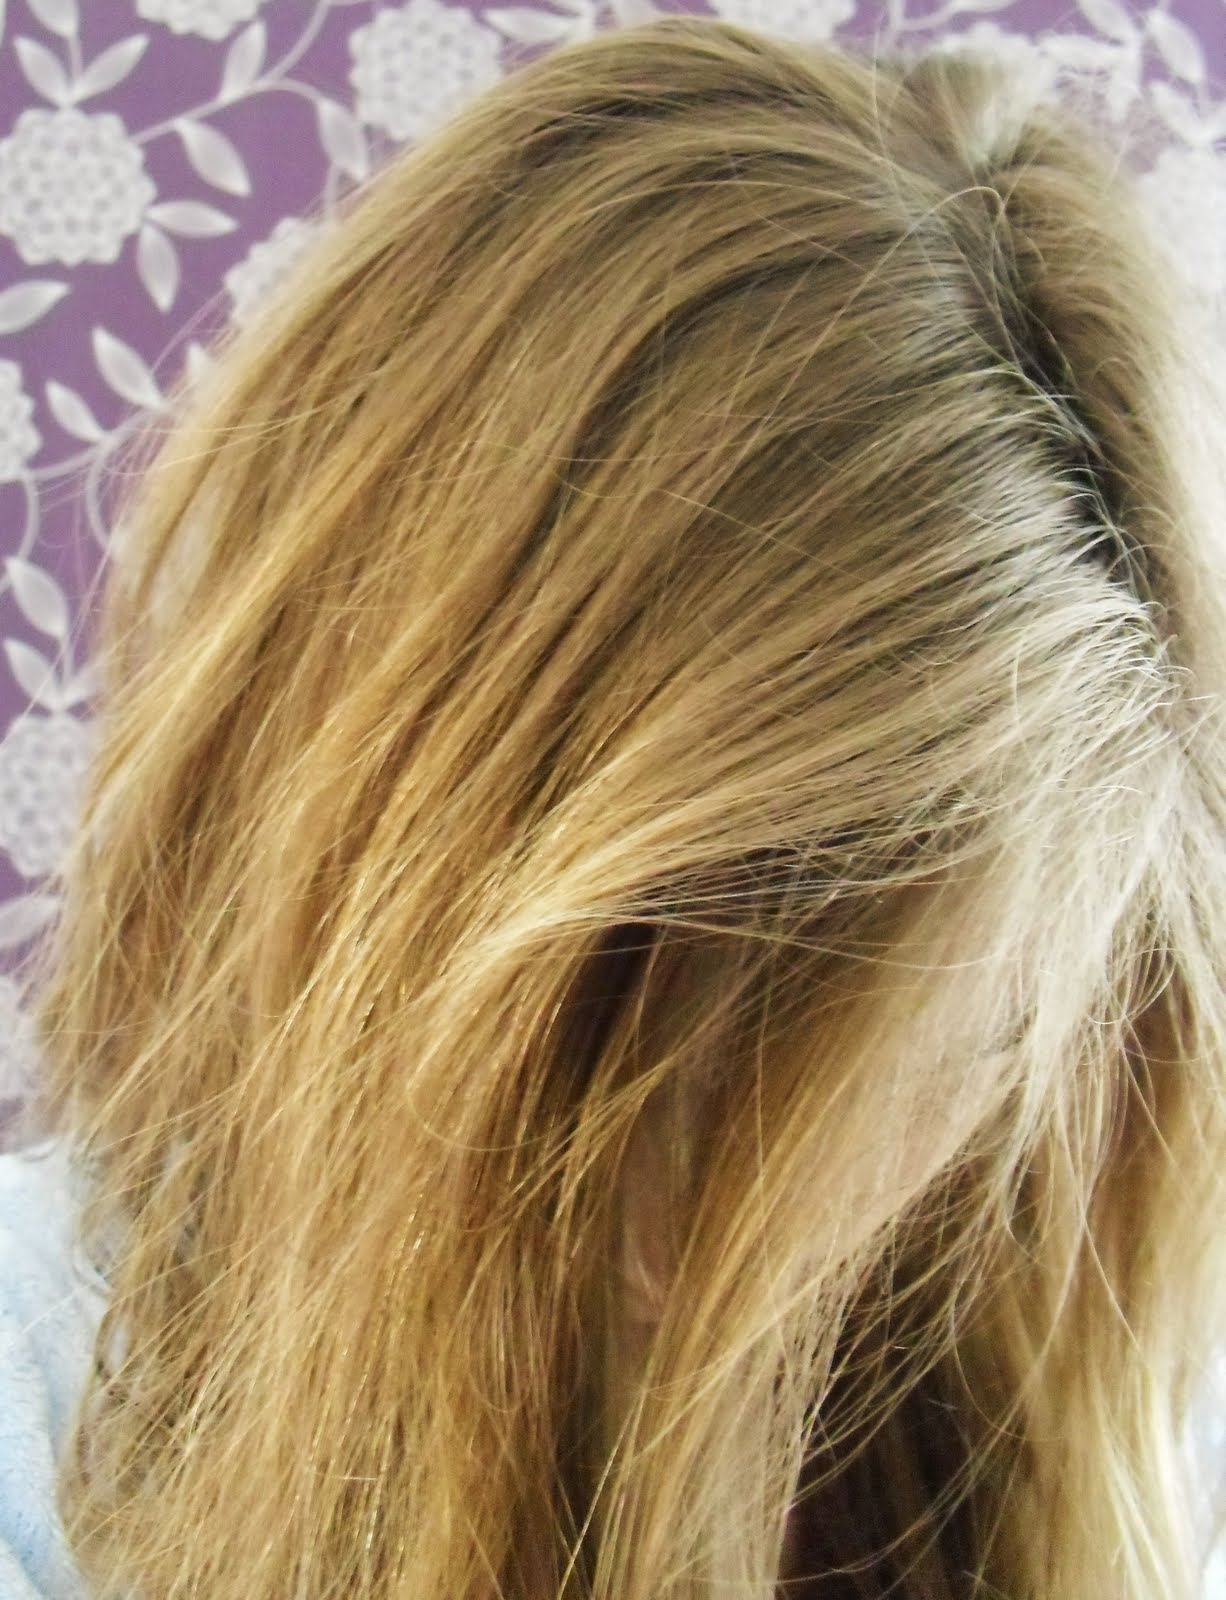 Subtle Purple Highlights In Blonde Hair I think the blonde version